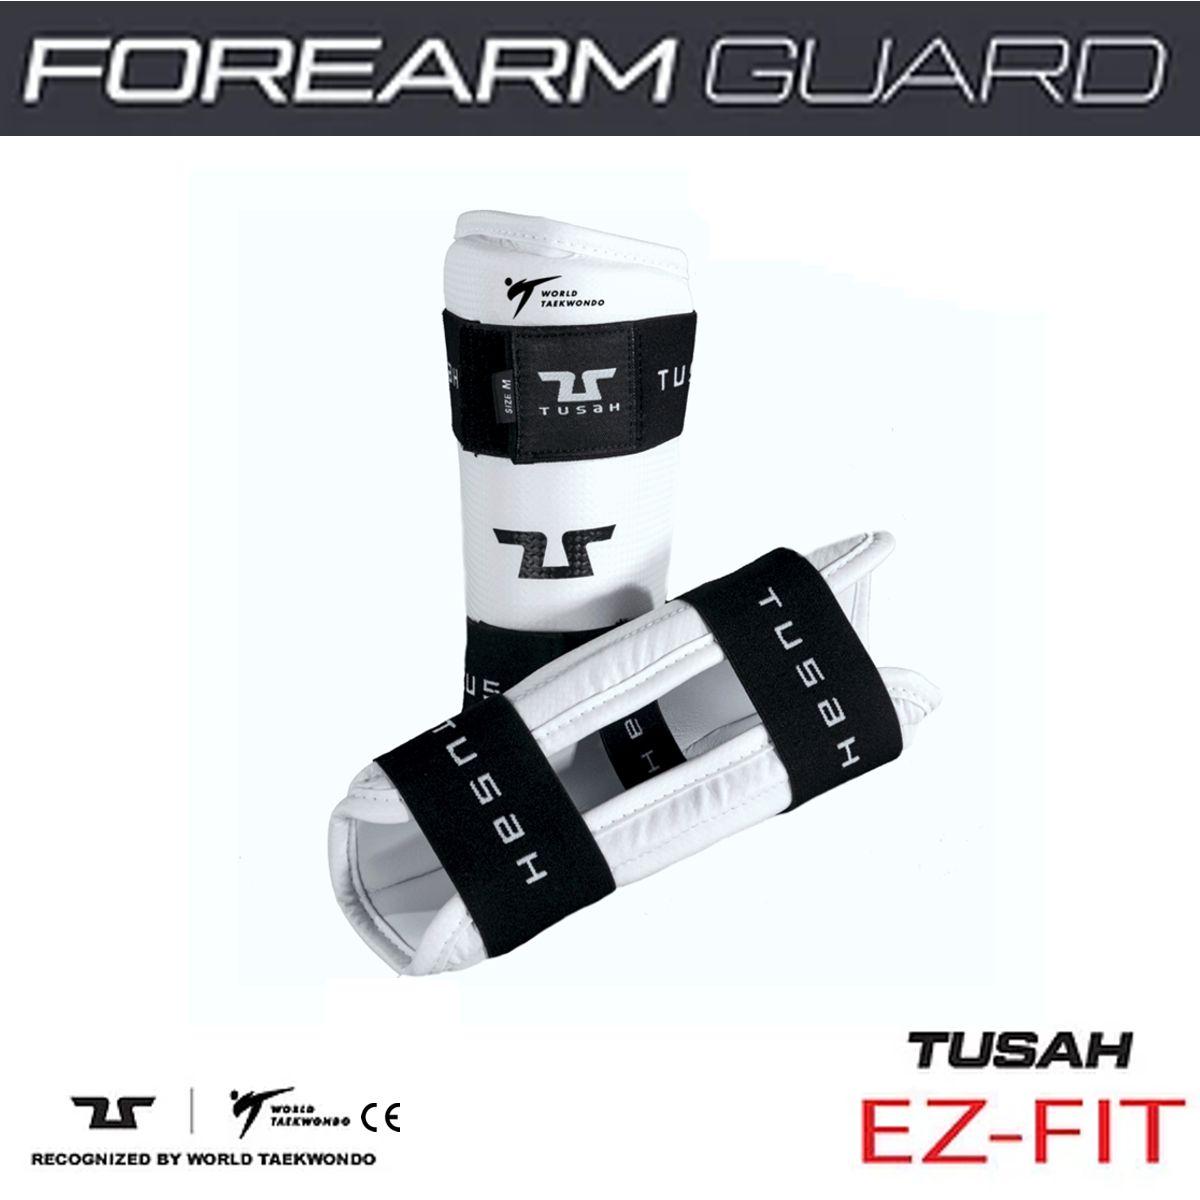 WT Approved Taekwondo Forearm